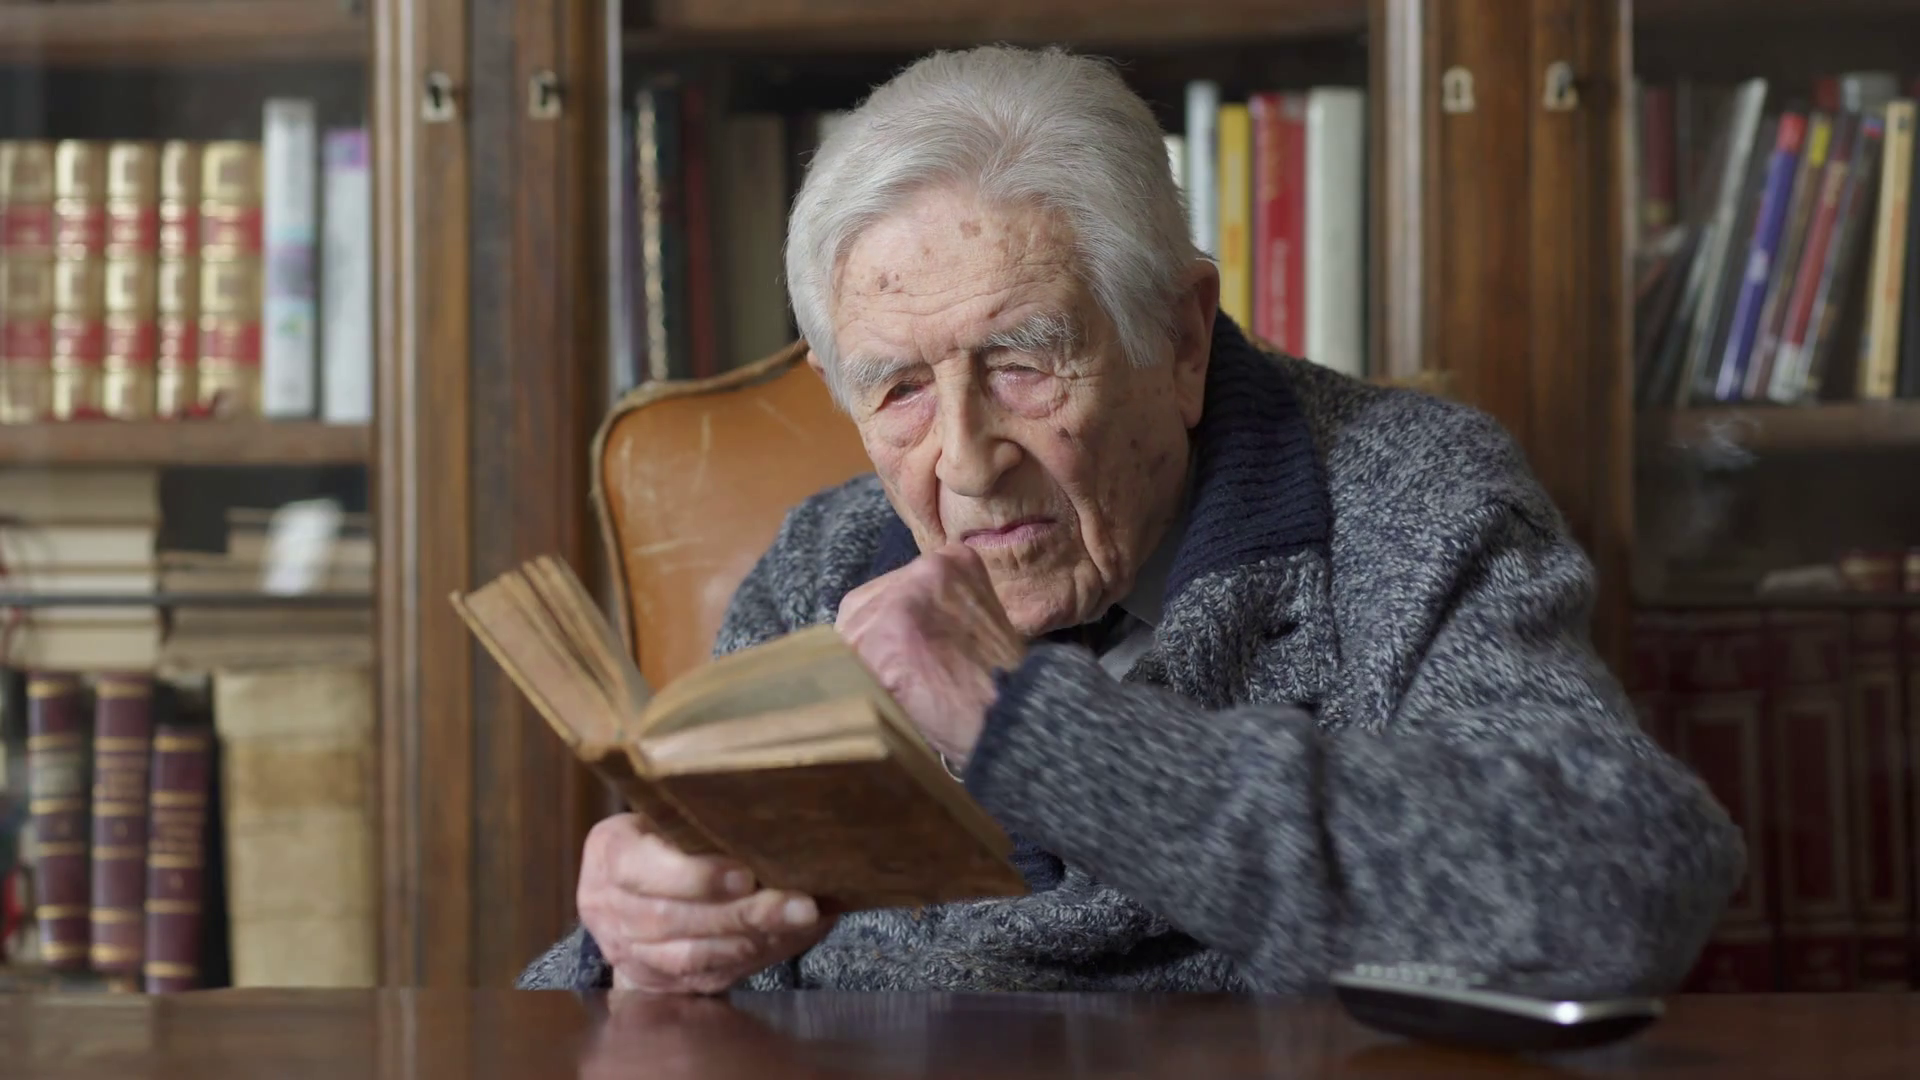 videoblocks-portrait-of-very-old-man-reading-a-book-sitting-at-the-desk_hr6hdtv0e_thumbnail-full01